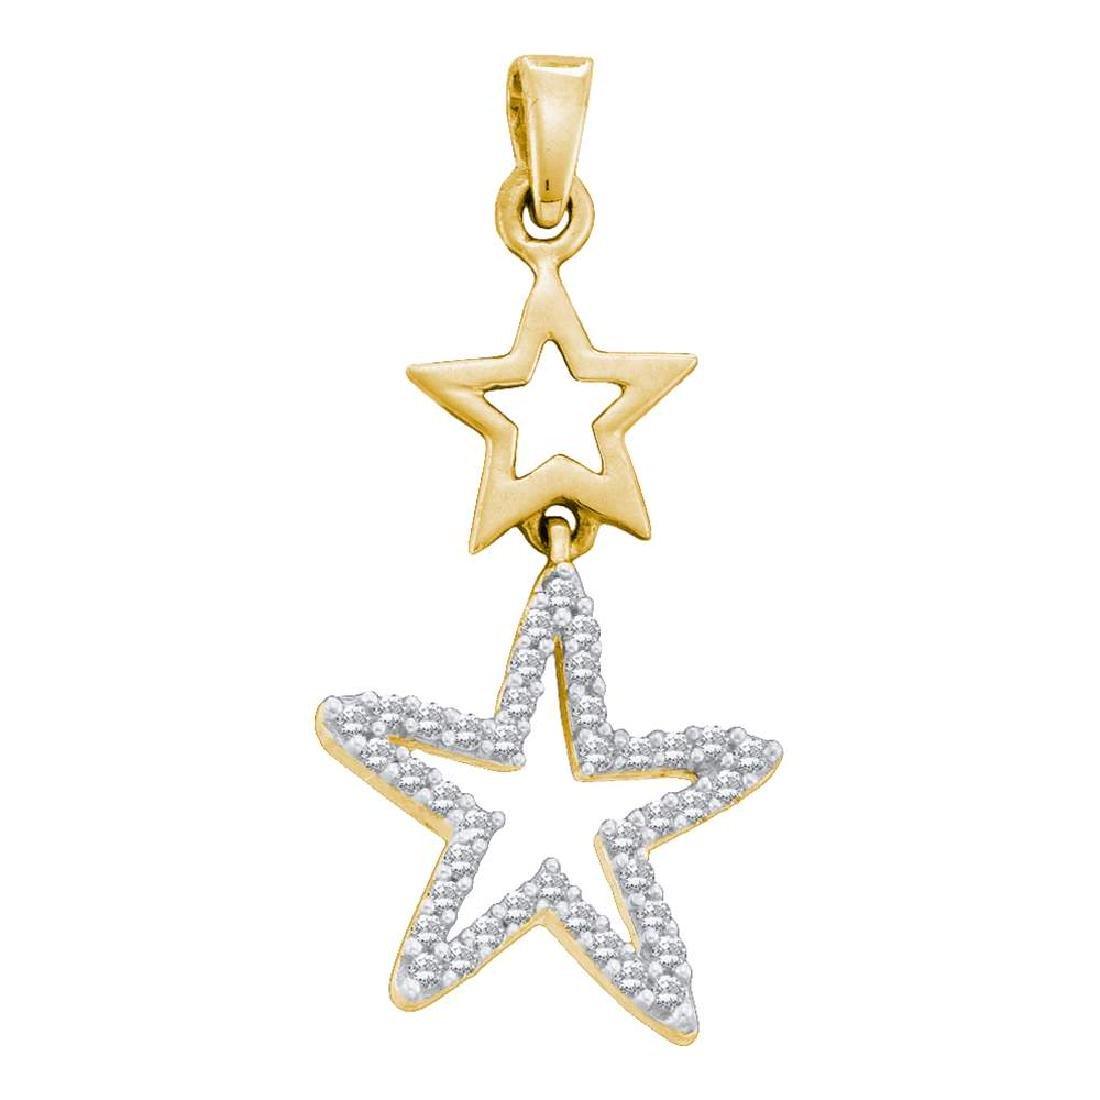 0.11 CTW Diamond Star Pendant 10KT Yellow Gold -